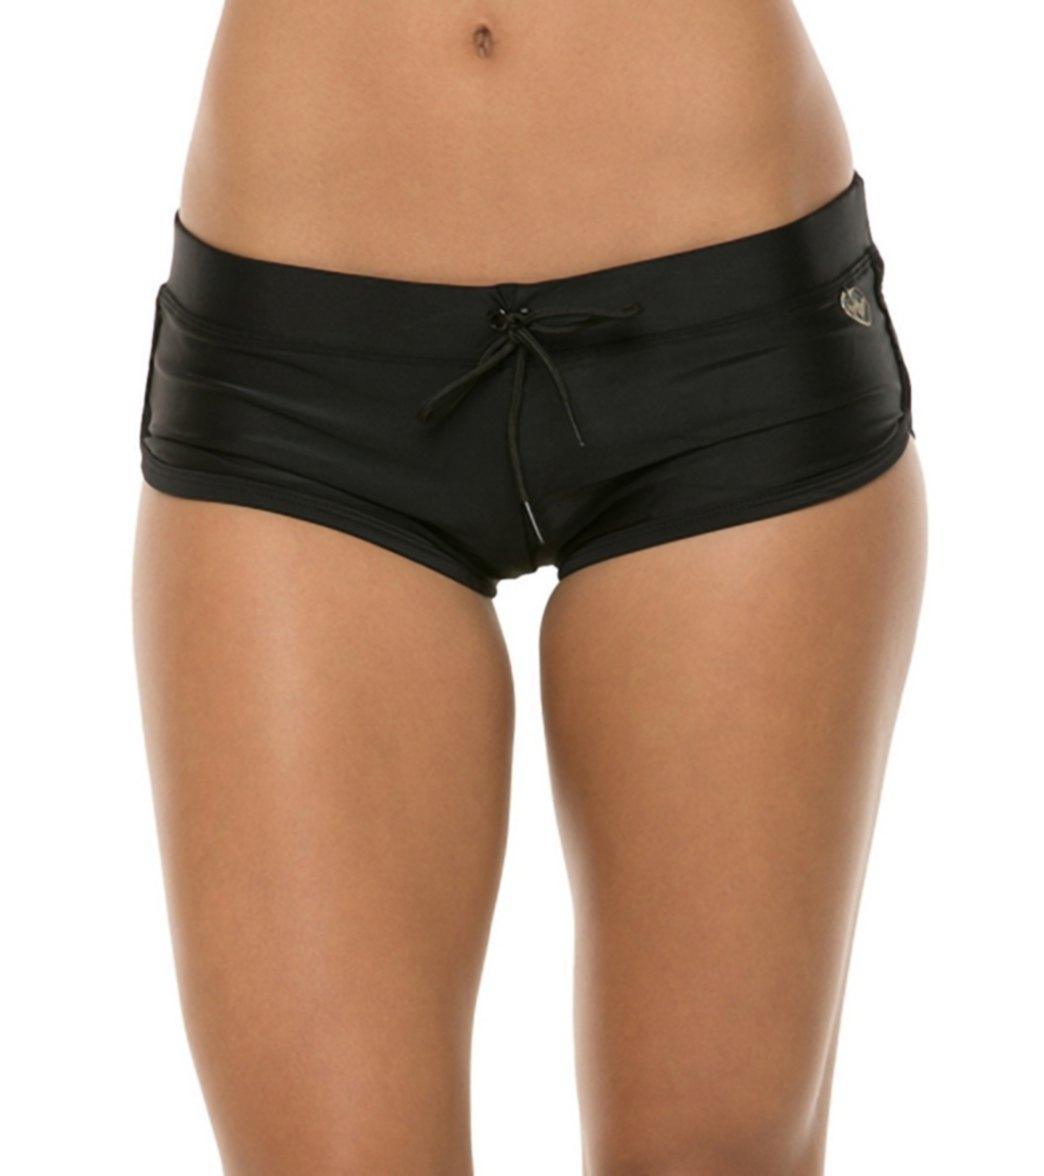 Body Glove Swimwear Smoothies Sidekick Sporty Boy Short Bikini Bottom